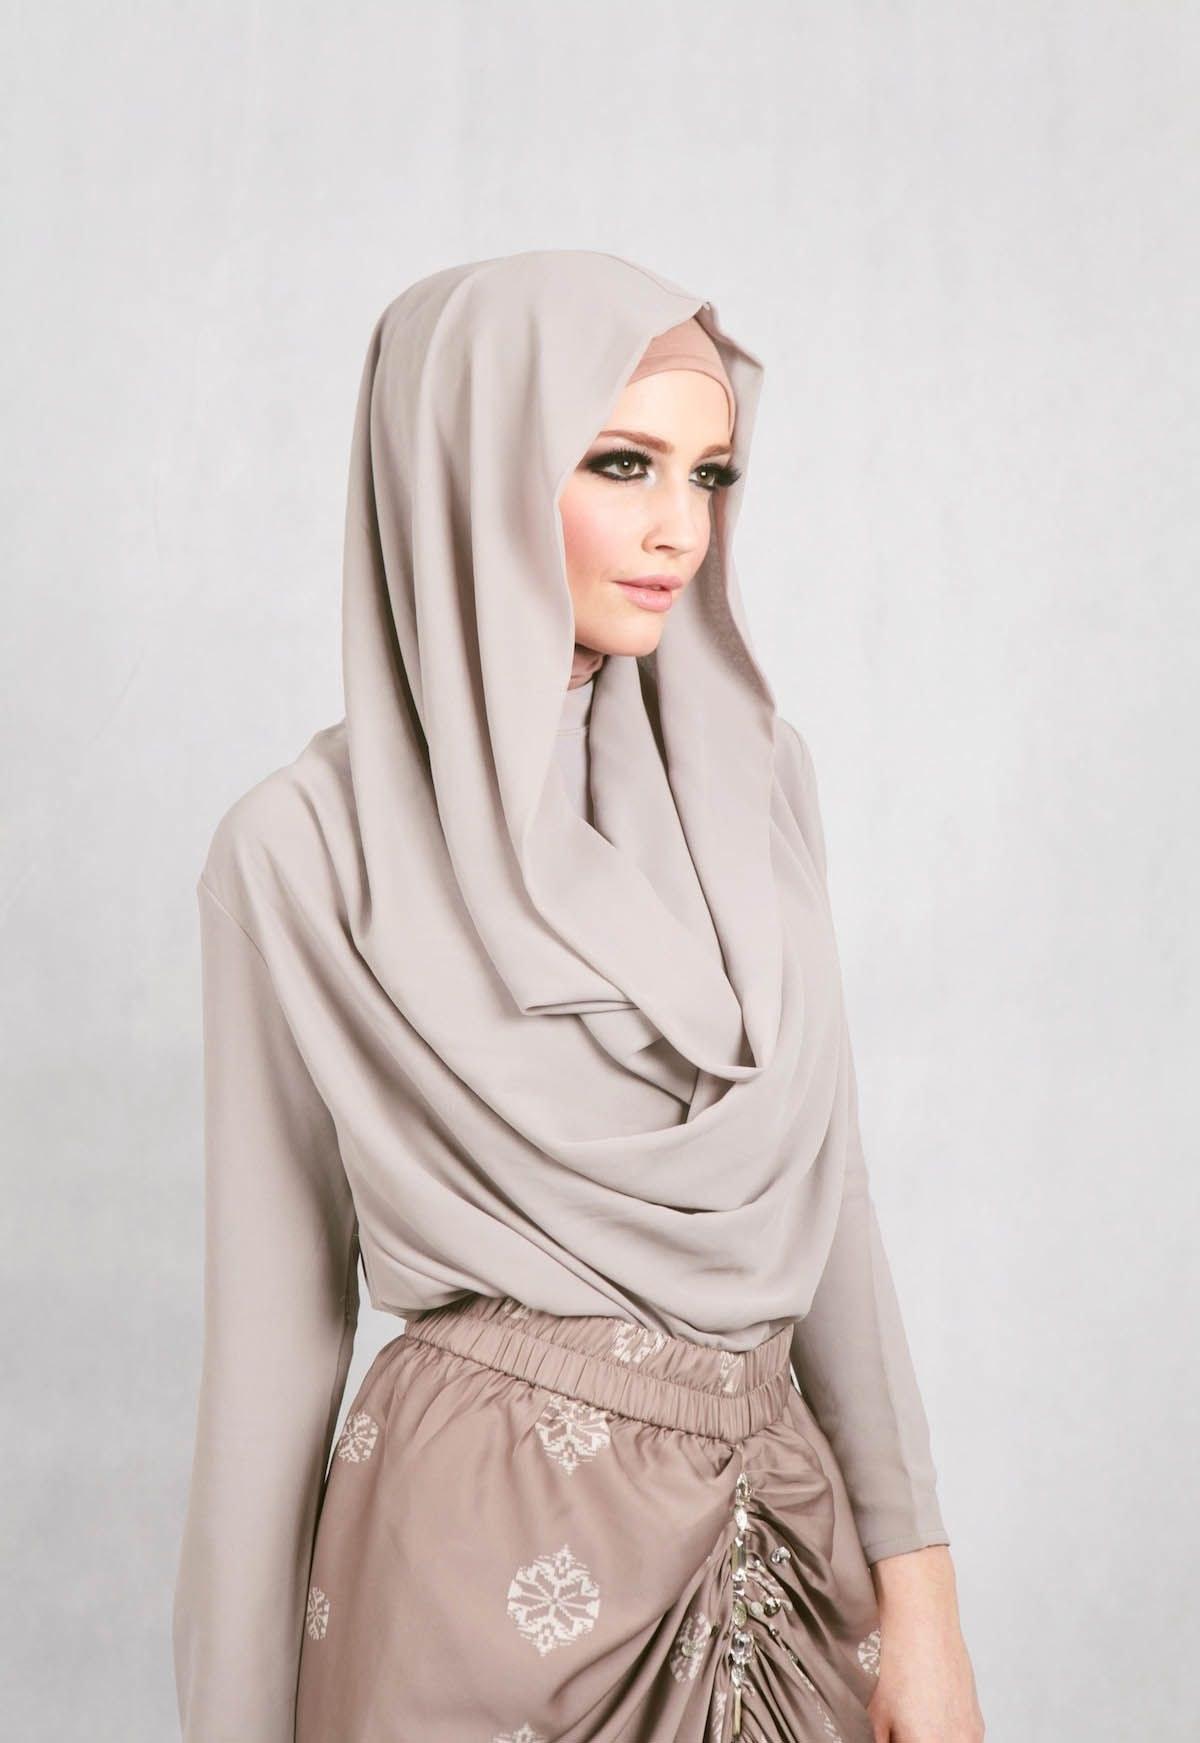 Bentuk Fashion Muslimah Modern Xtd6 Muslimah Fashion & Hijab Style Hijjap